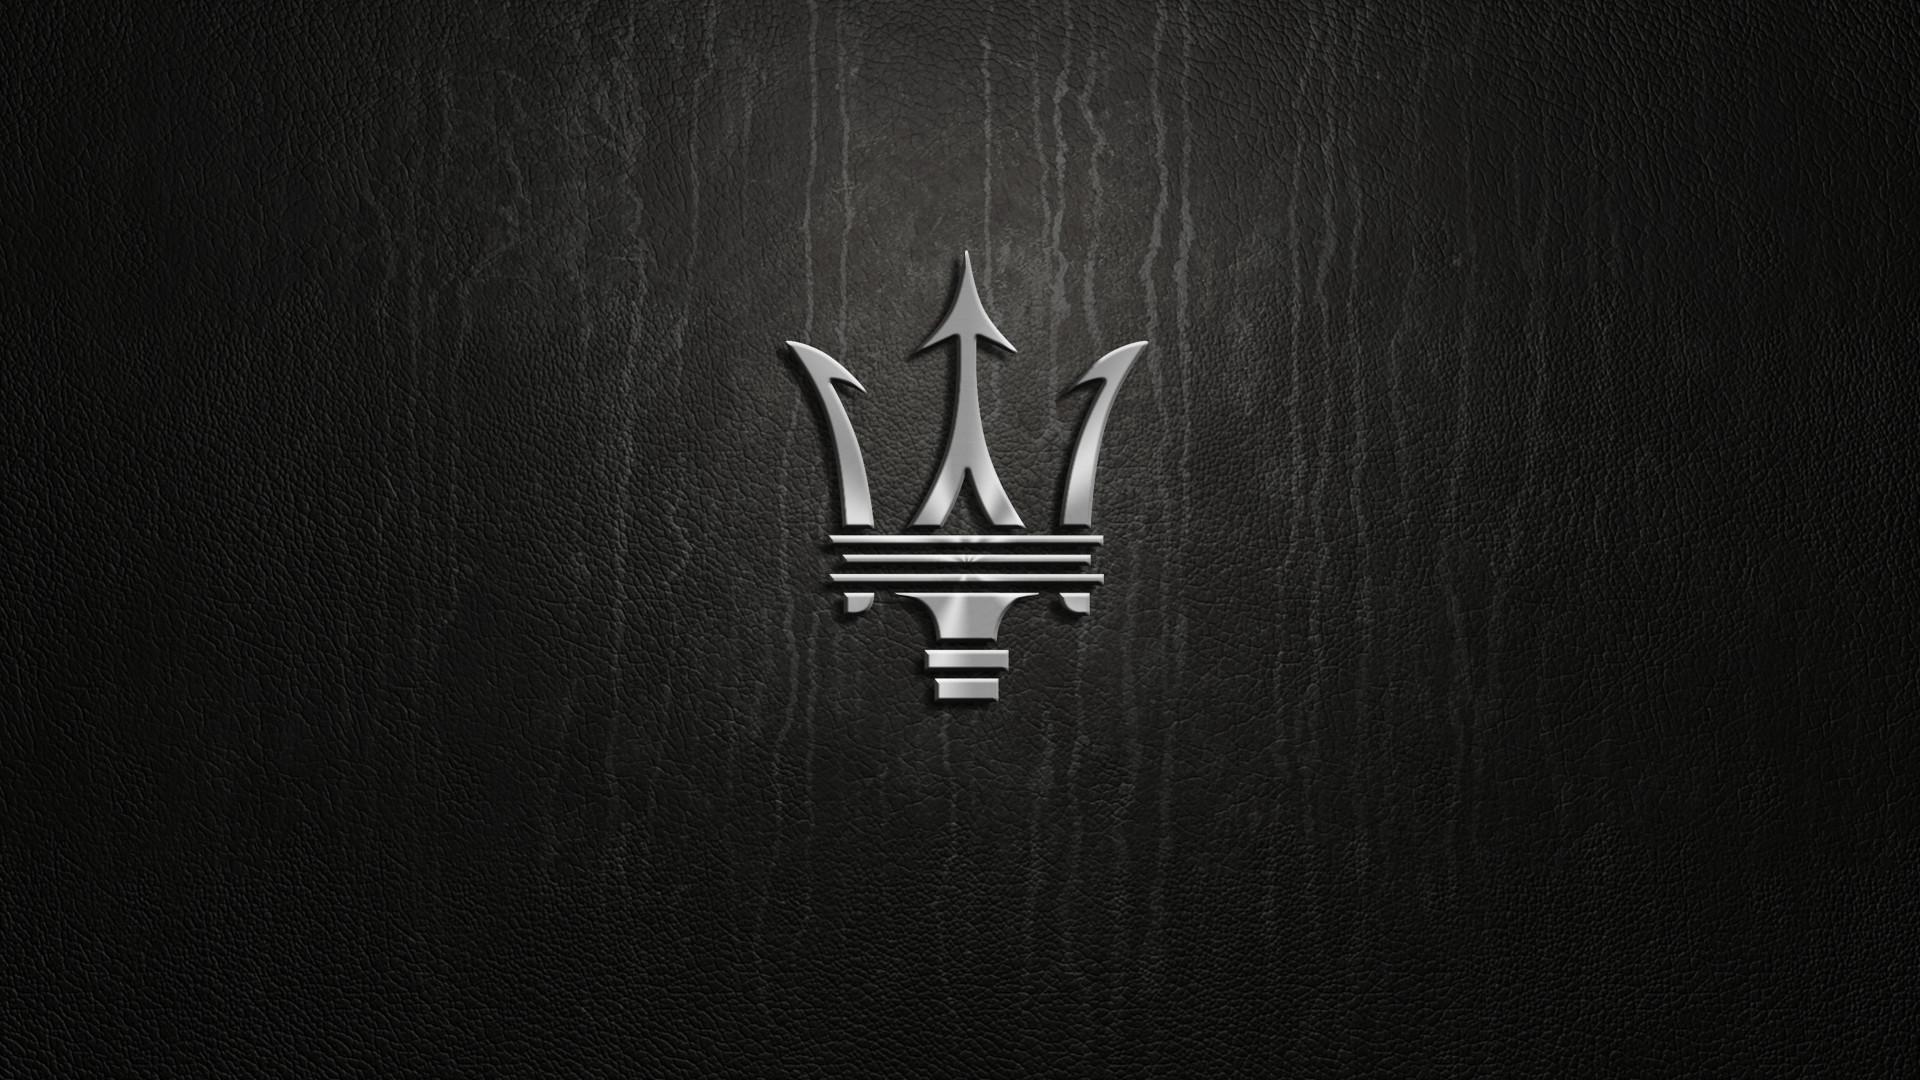 64 Maserati Logo Wallpapers on WallpaperPlay 1920x1080